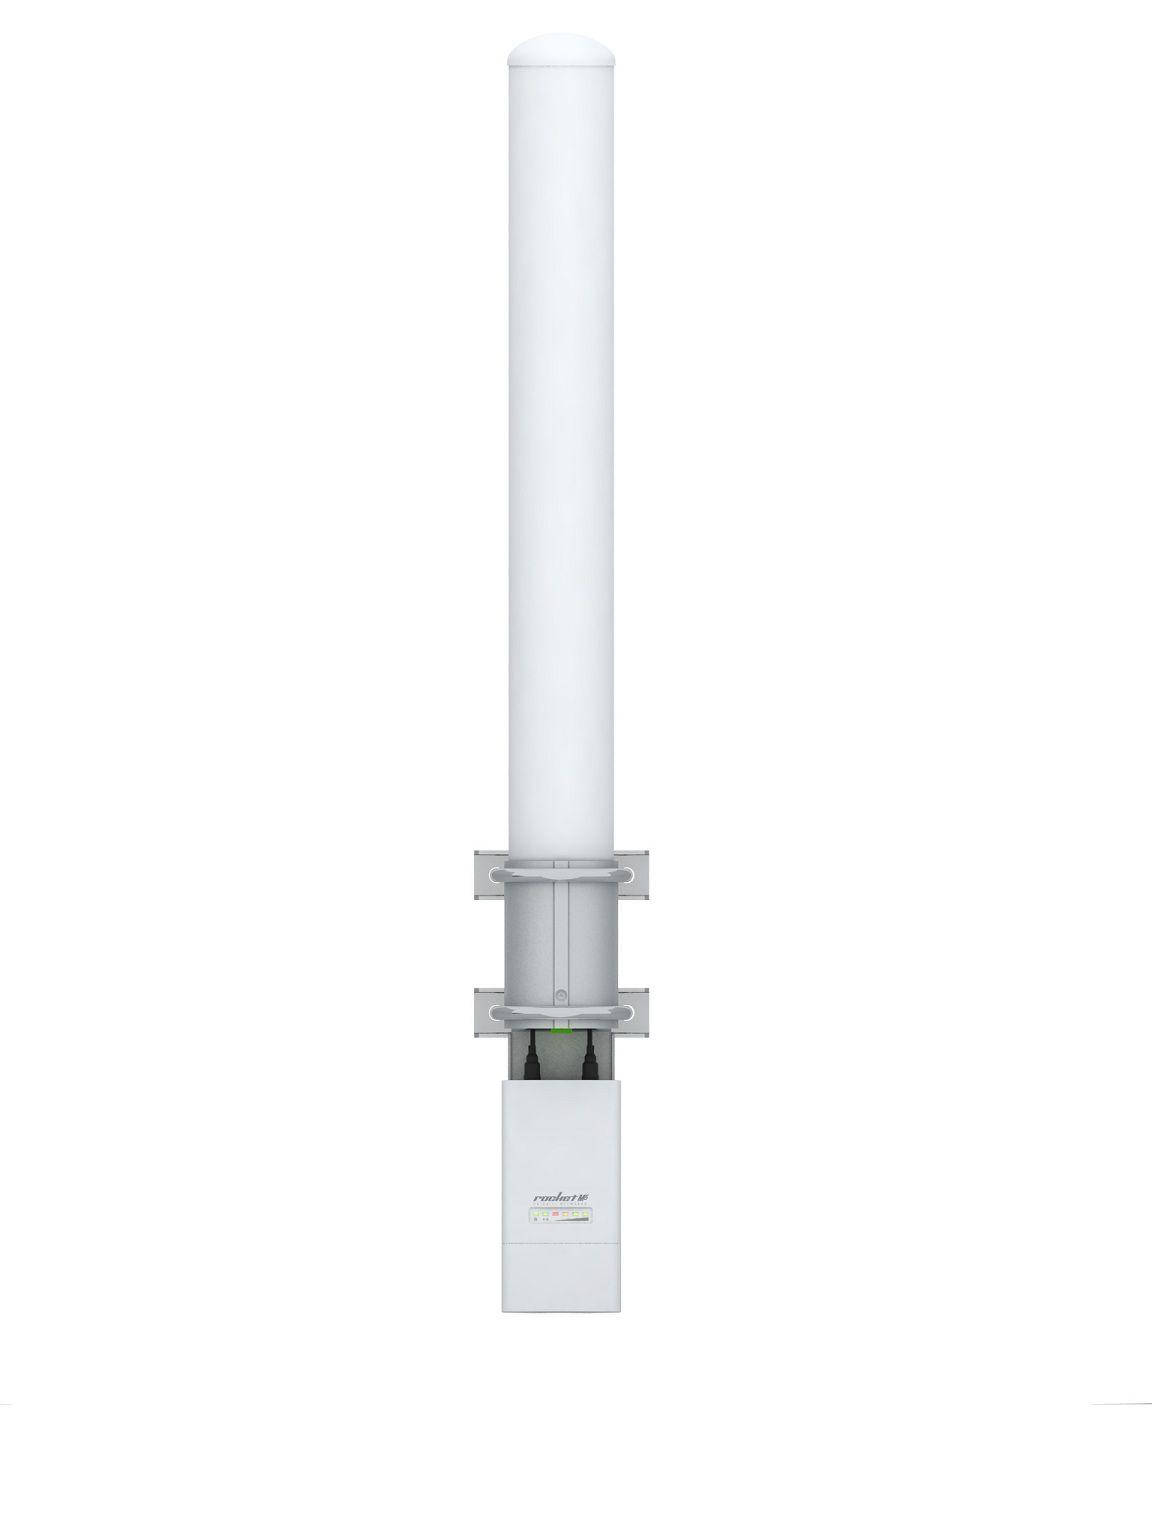 Ubnt Amo-2G13 2.4Ghz Airmax Antena Omni 13Dbi Rocket